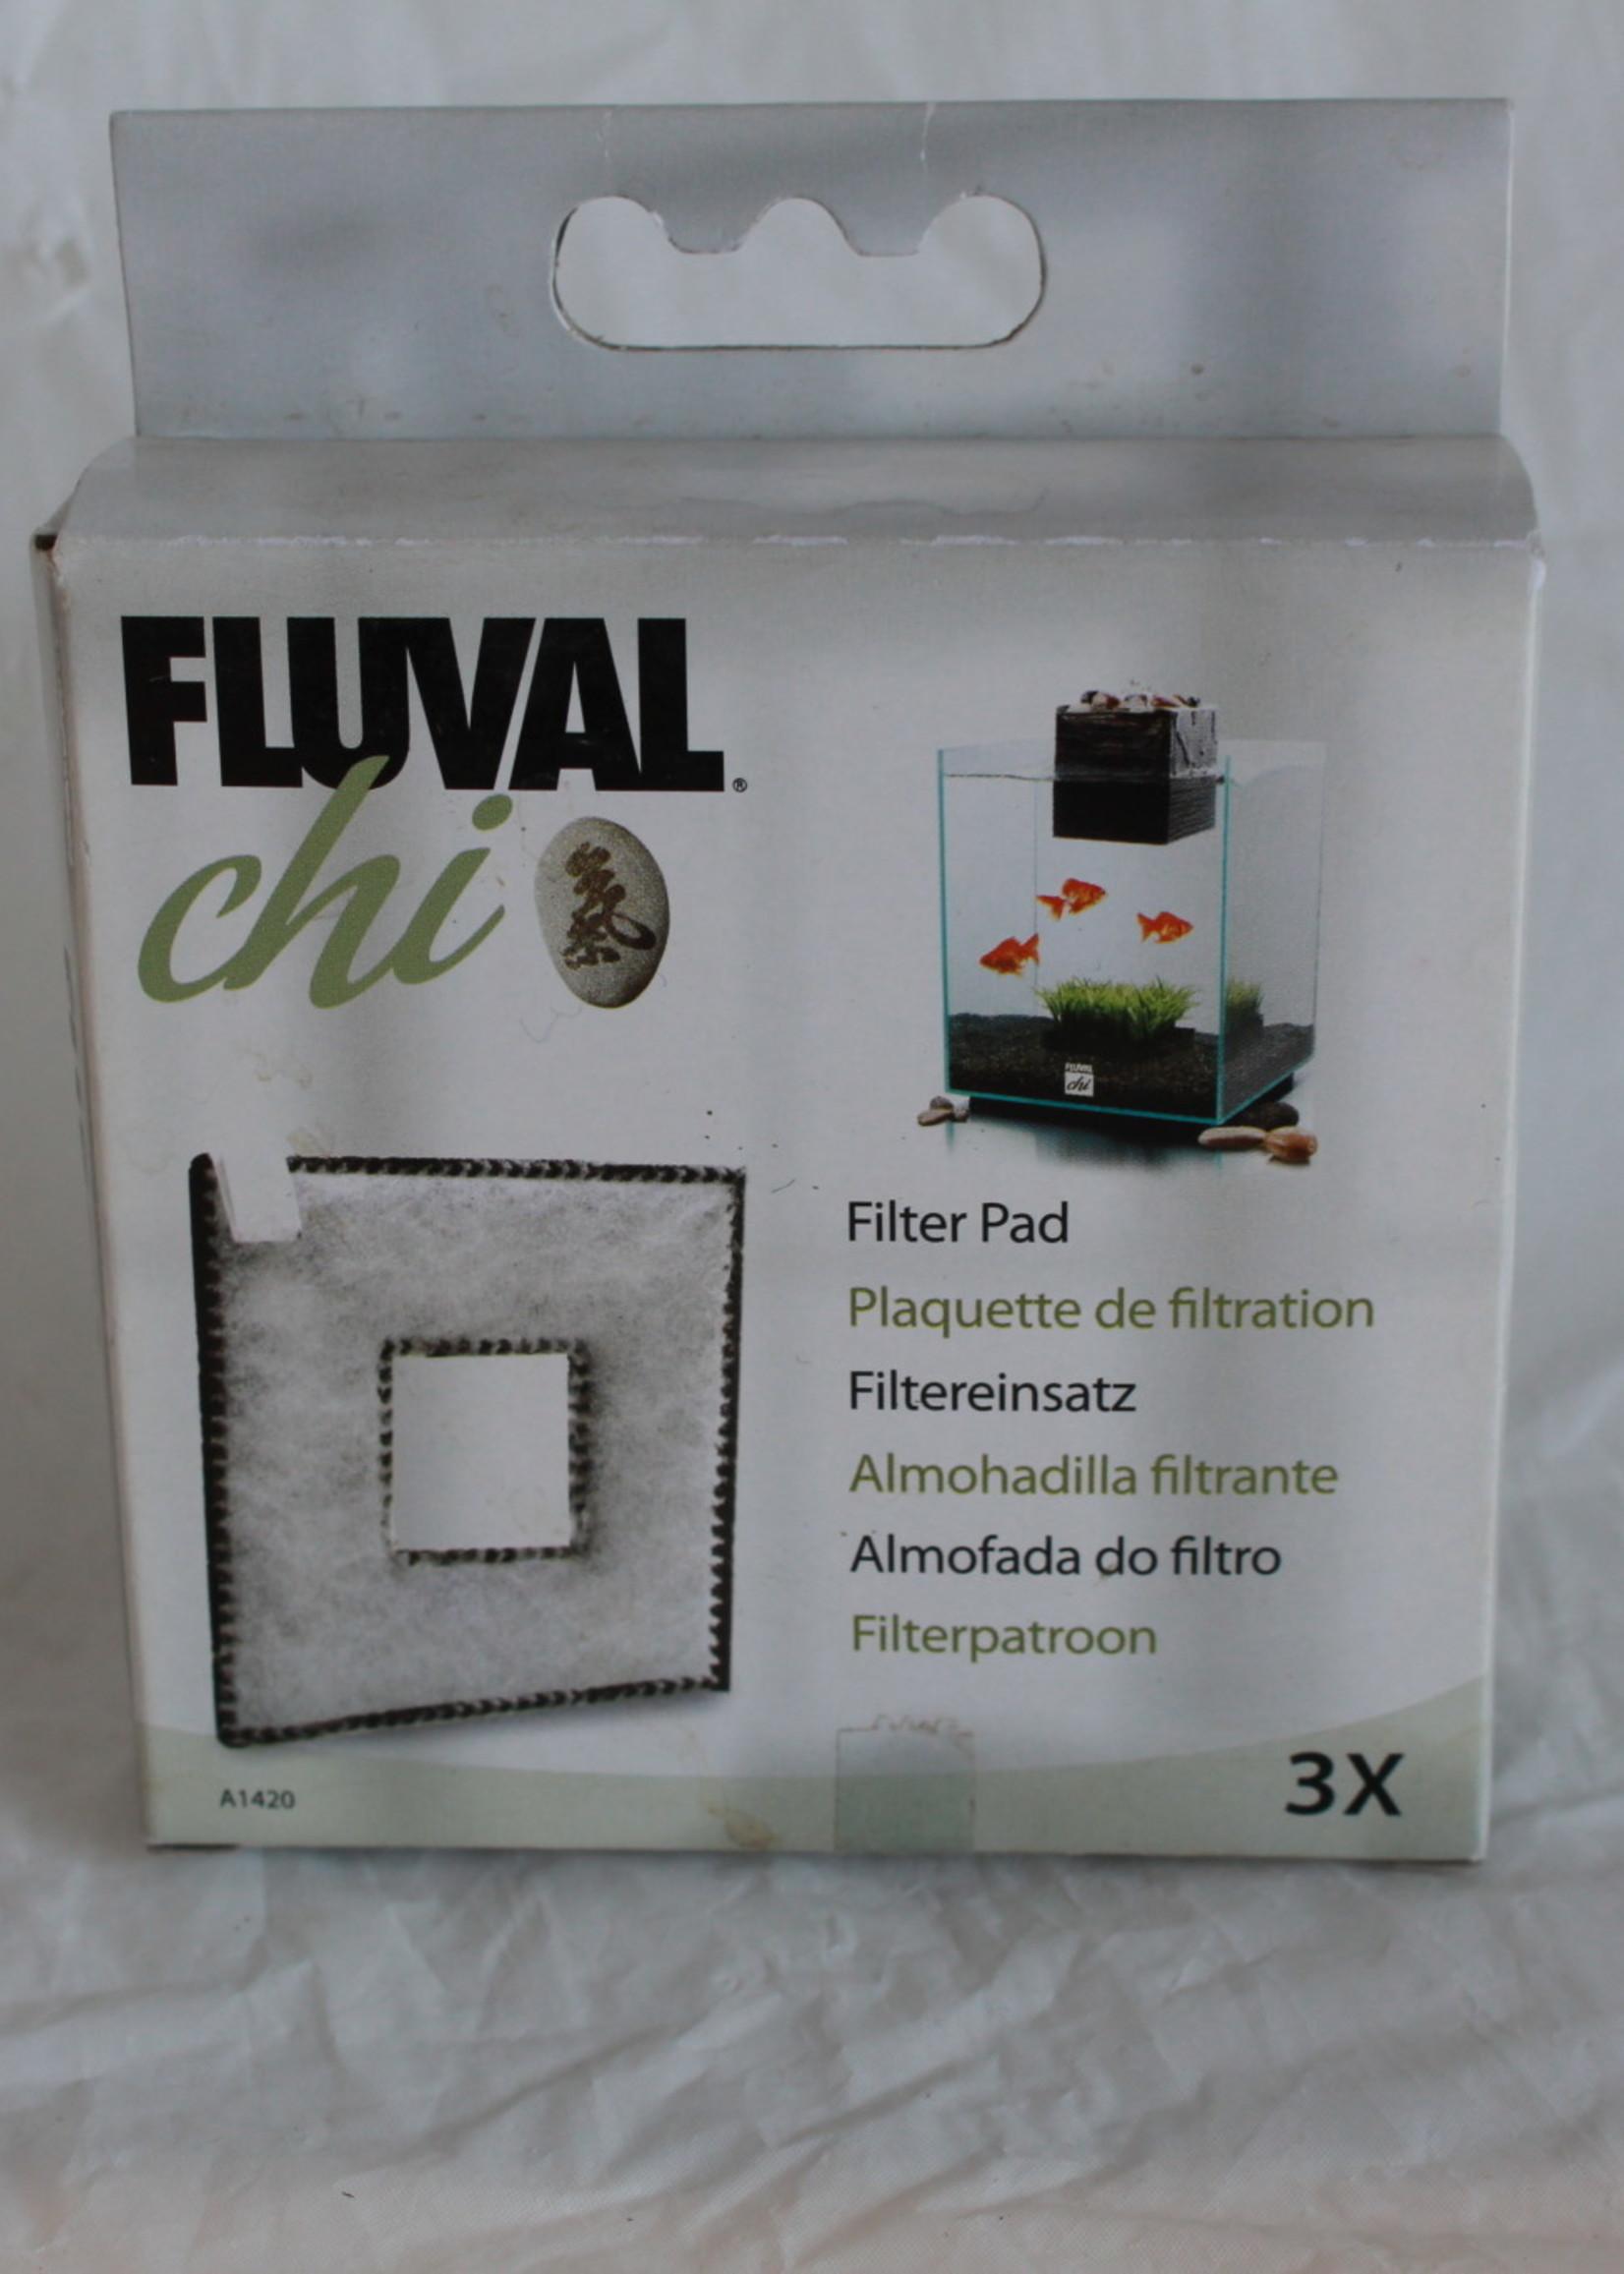 Filter Pad for Fluval Chi 3-pack